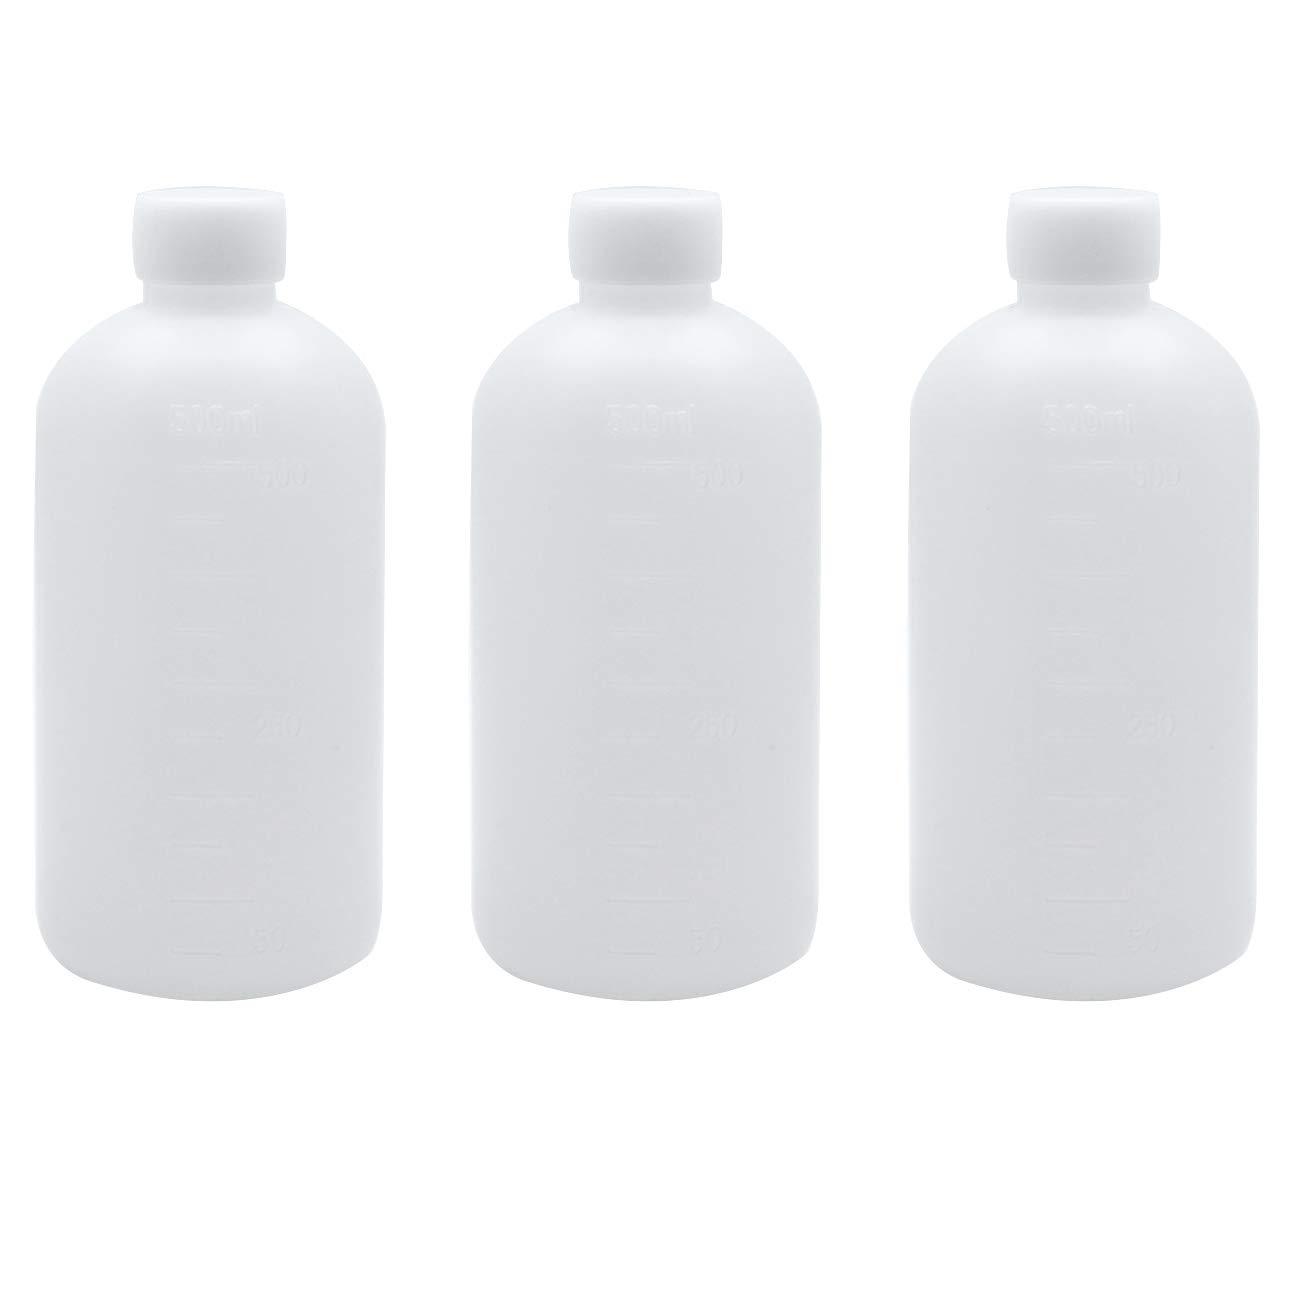 Sscon 3pcs 500ml Plastic Small Mouth Graduated Lab Reagent Bottle Sample Sealing Bottle